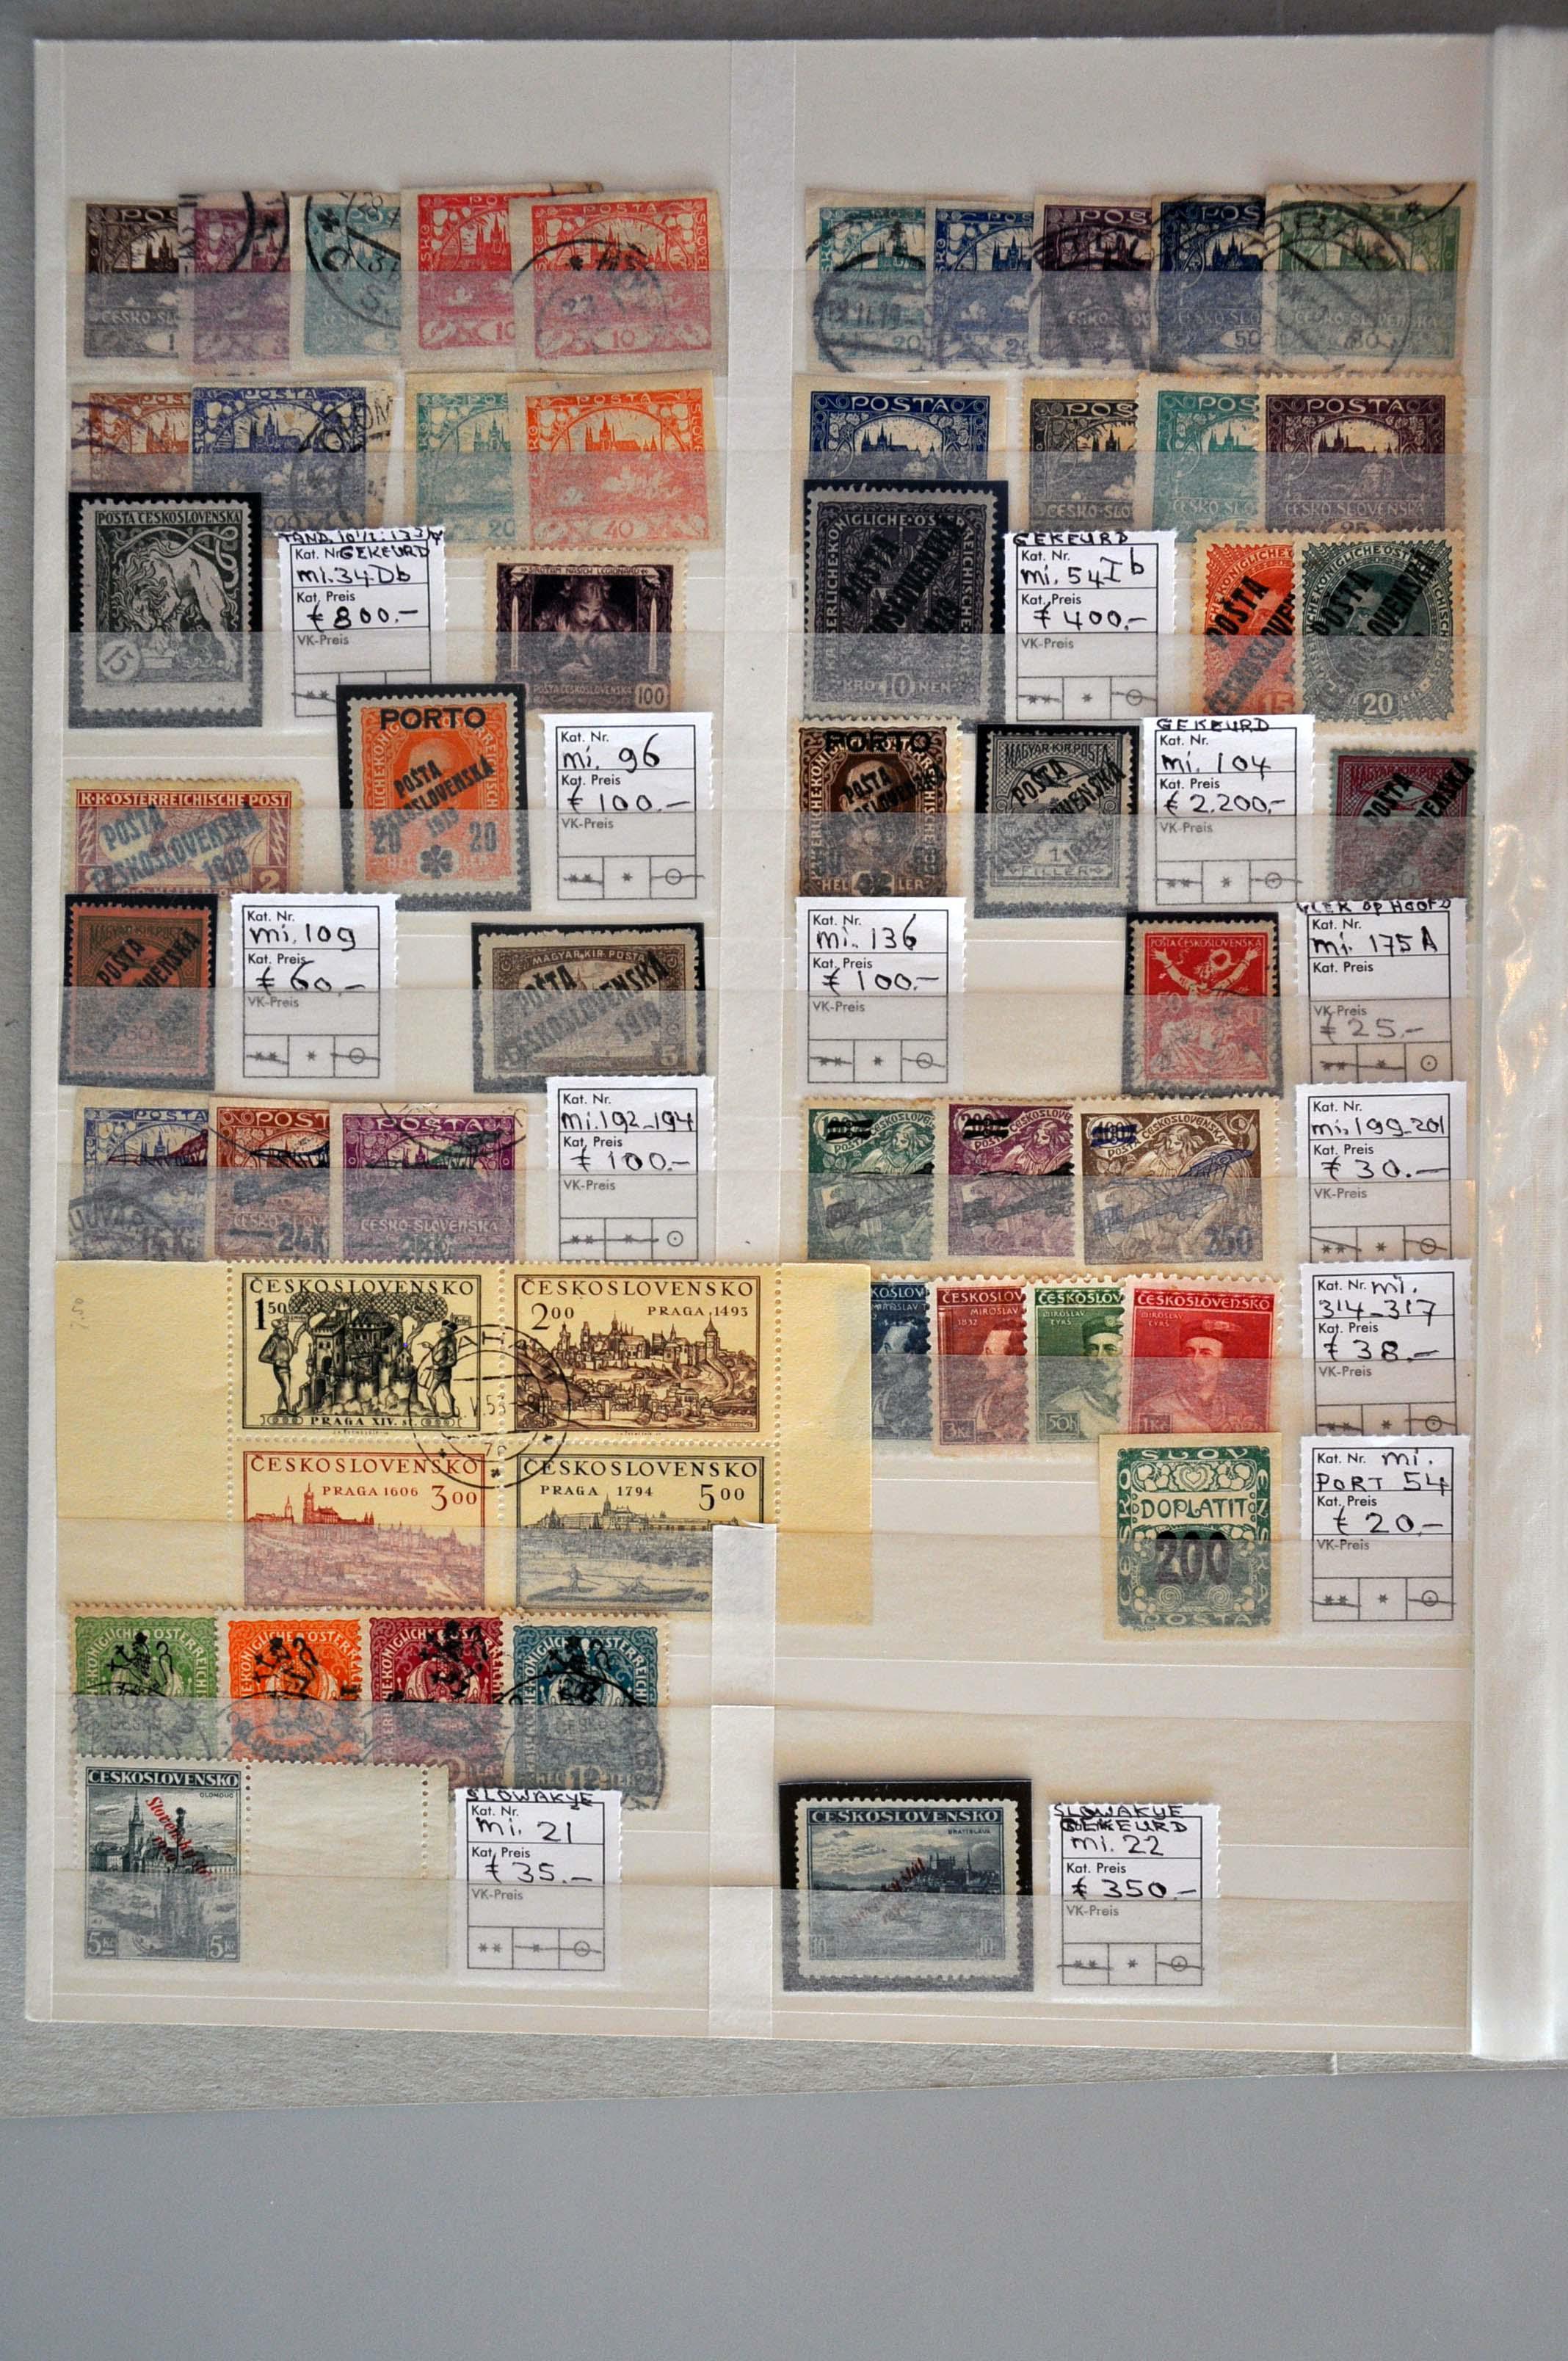 Lot 599 - European Countries Czechoslovakia -  Corinphila Veilingen Auction 245-246 Day 2 - Foreign countries - Collections and lots, Foreign countries - Boxes and literature